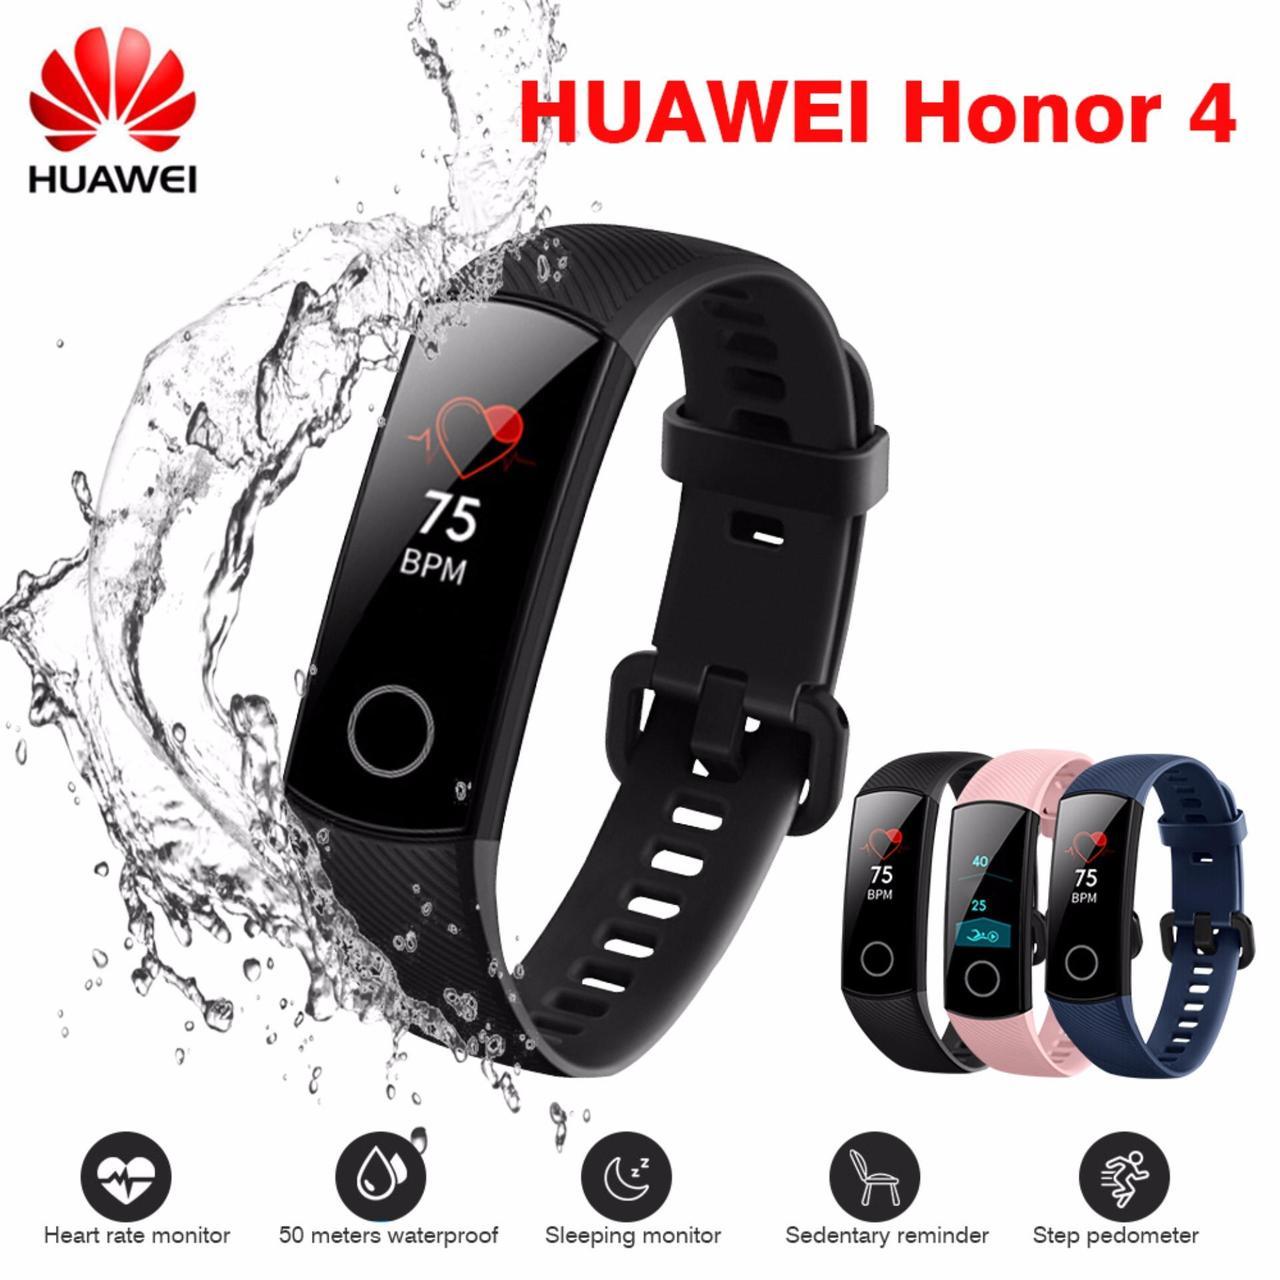 458972b8 Huawei Honor band 4 , фитнес браслет. смарт часы, фитнес трекер, конкурент  для